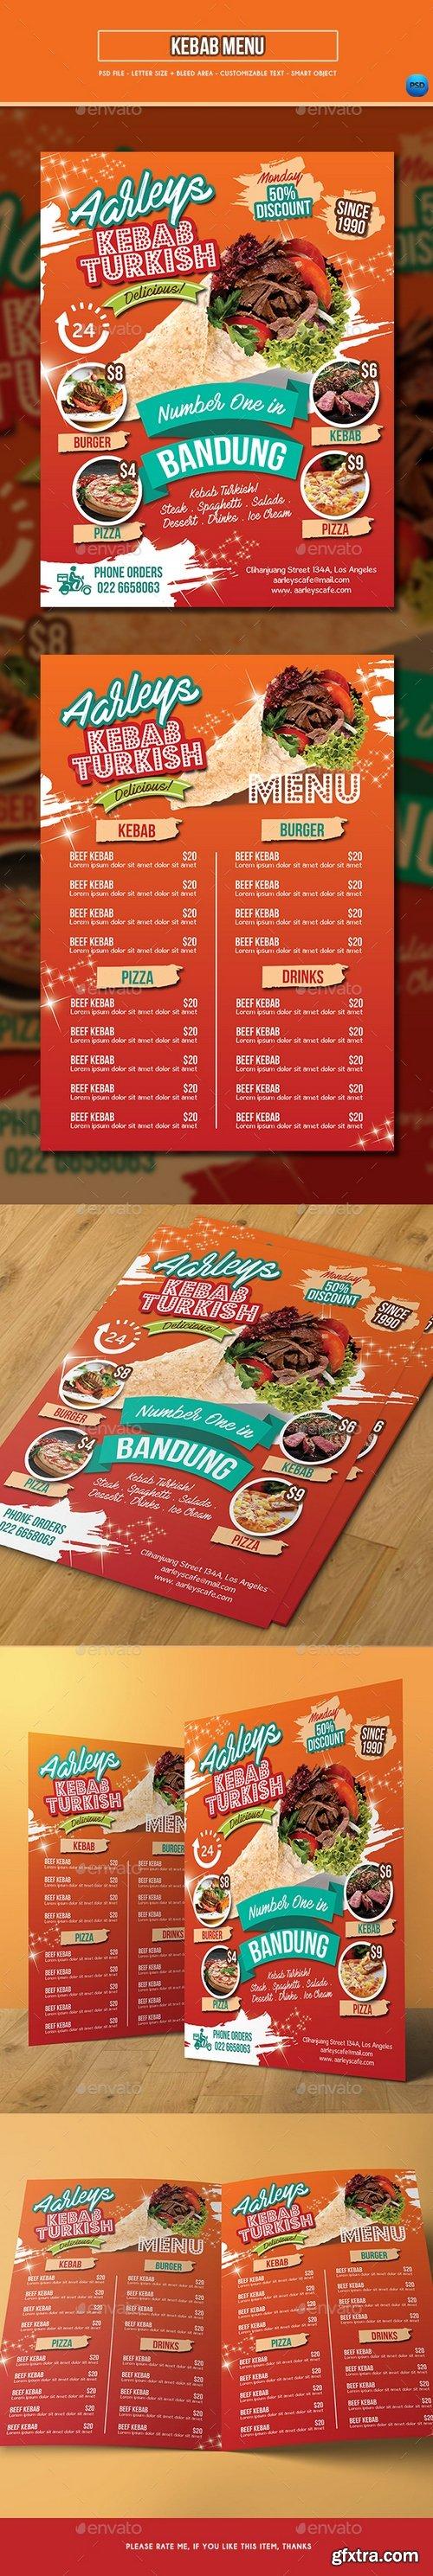 Graphicriver - Kebab Menu Template 20925151